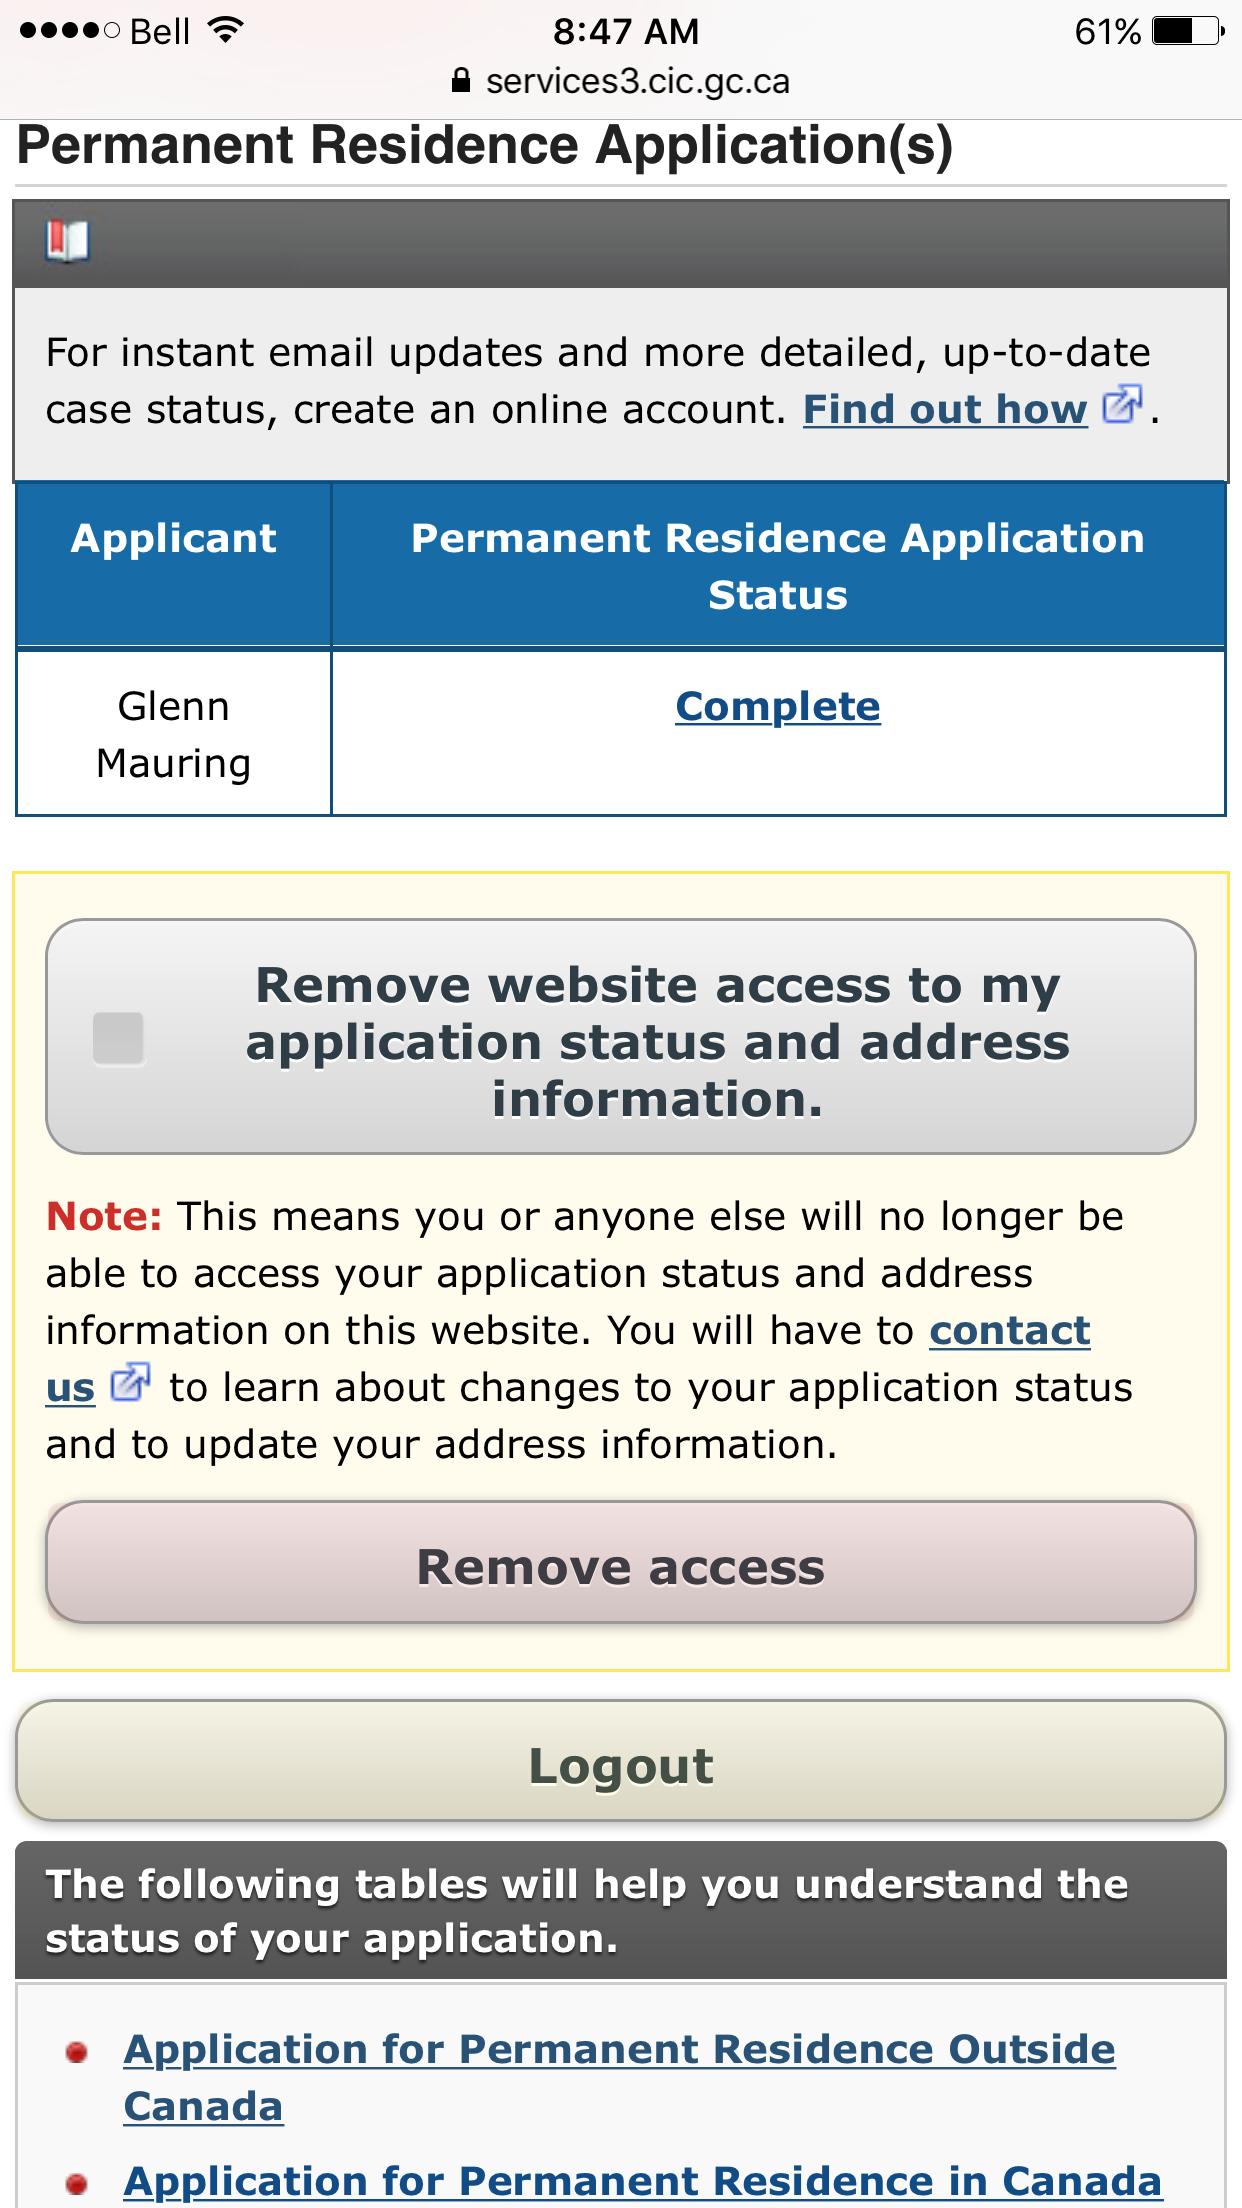 cic application status decision made 2017